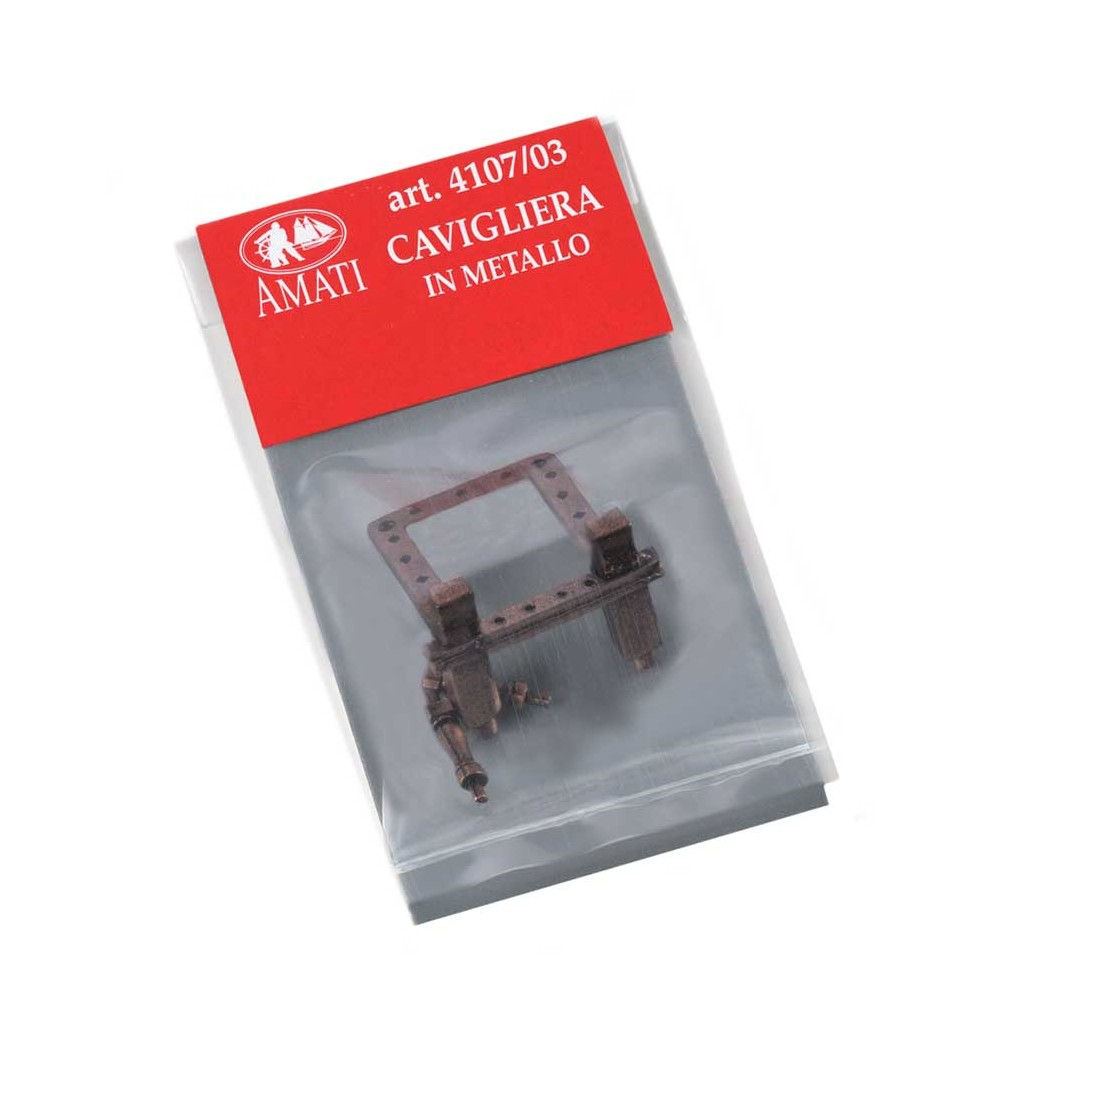 Pasadores de metal para mástiles mm.25x25x18